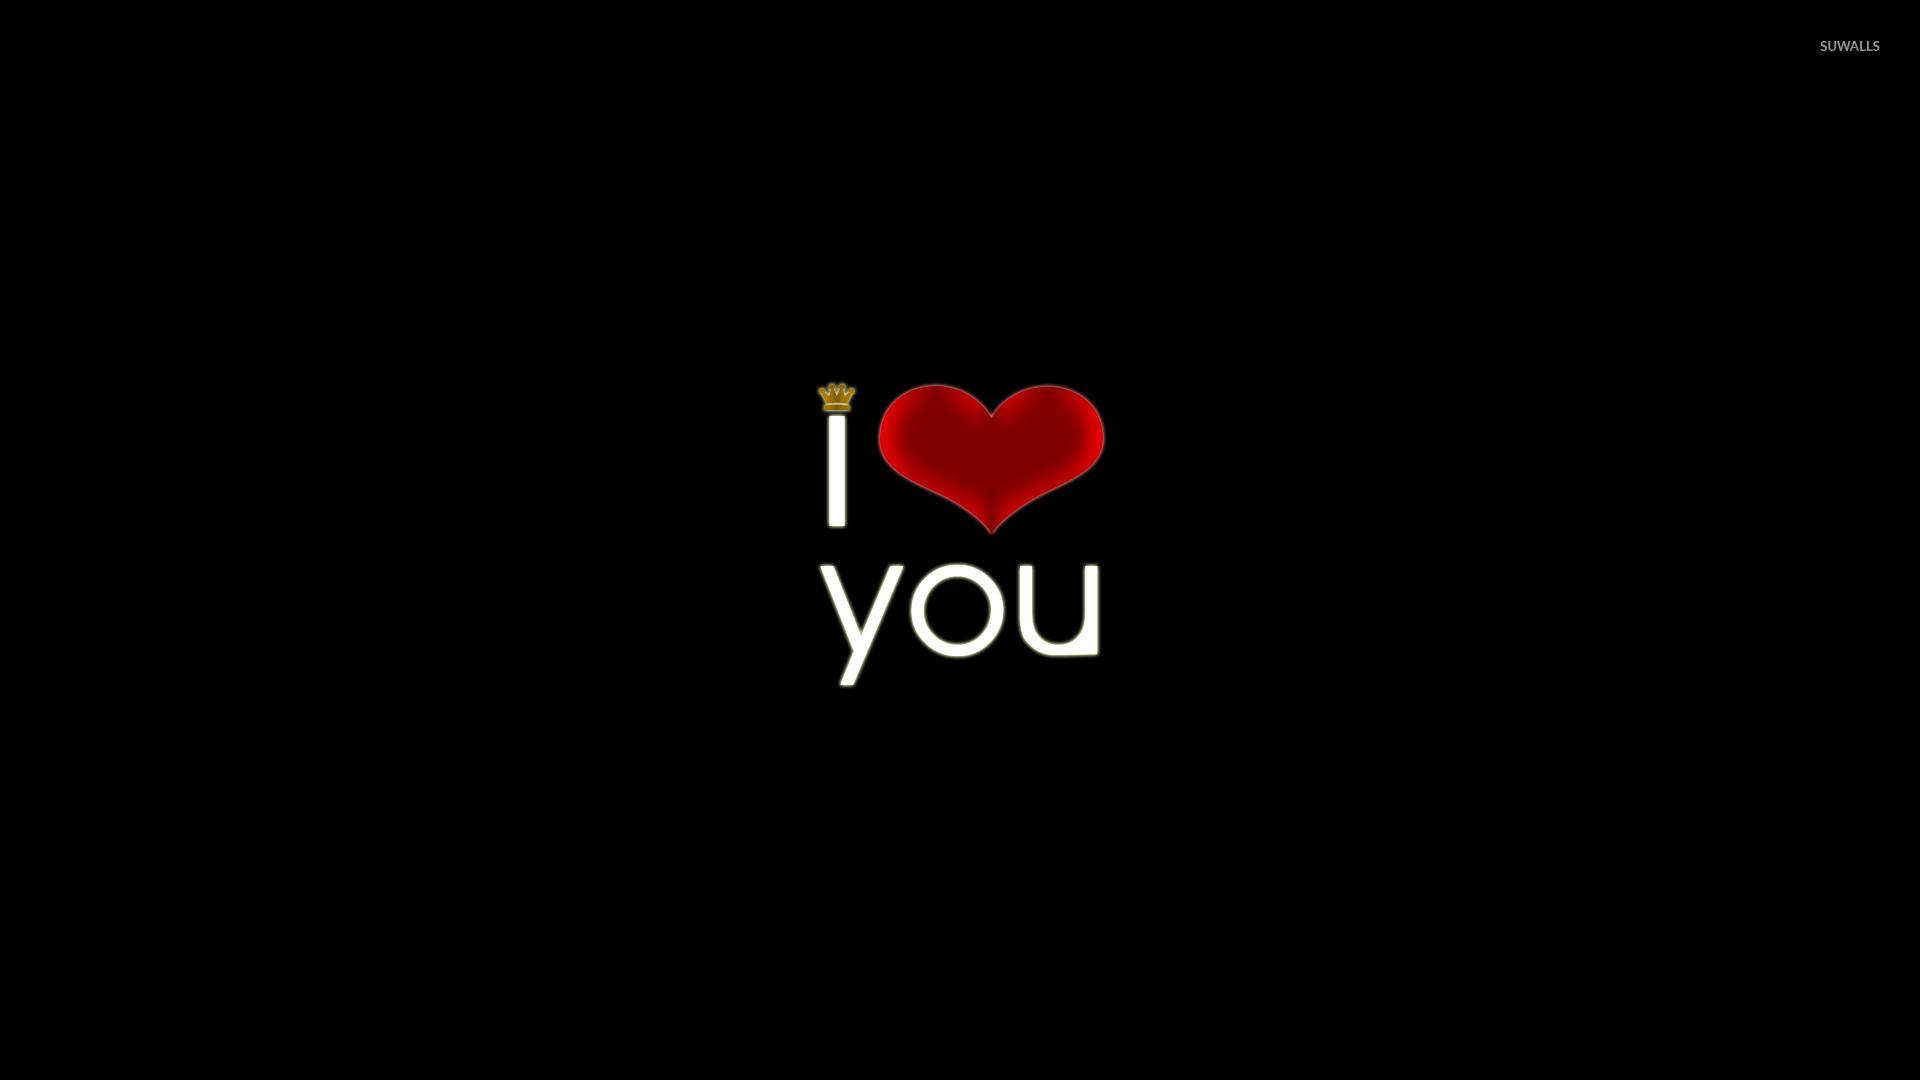 I Love You 5 Wallpaper